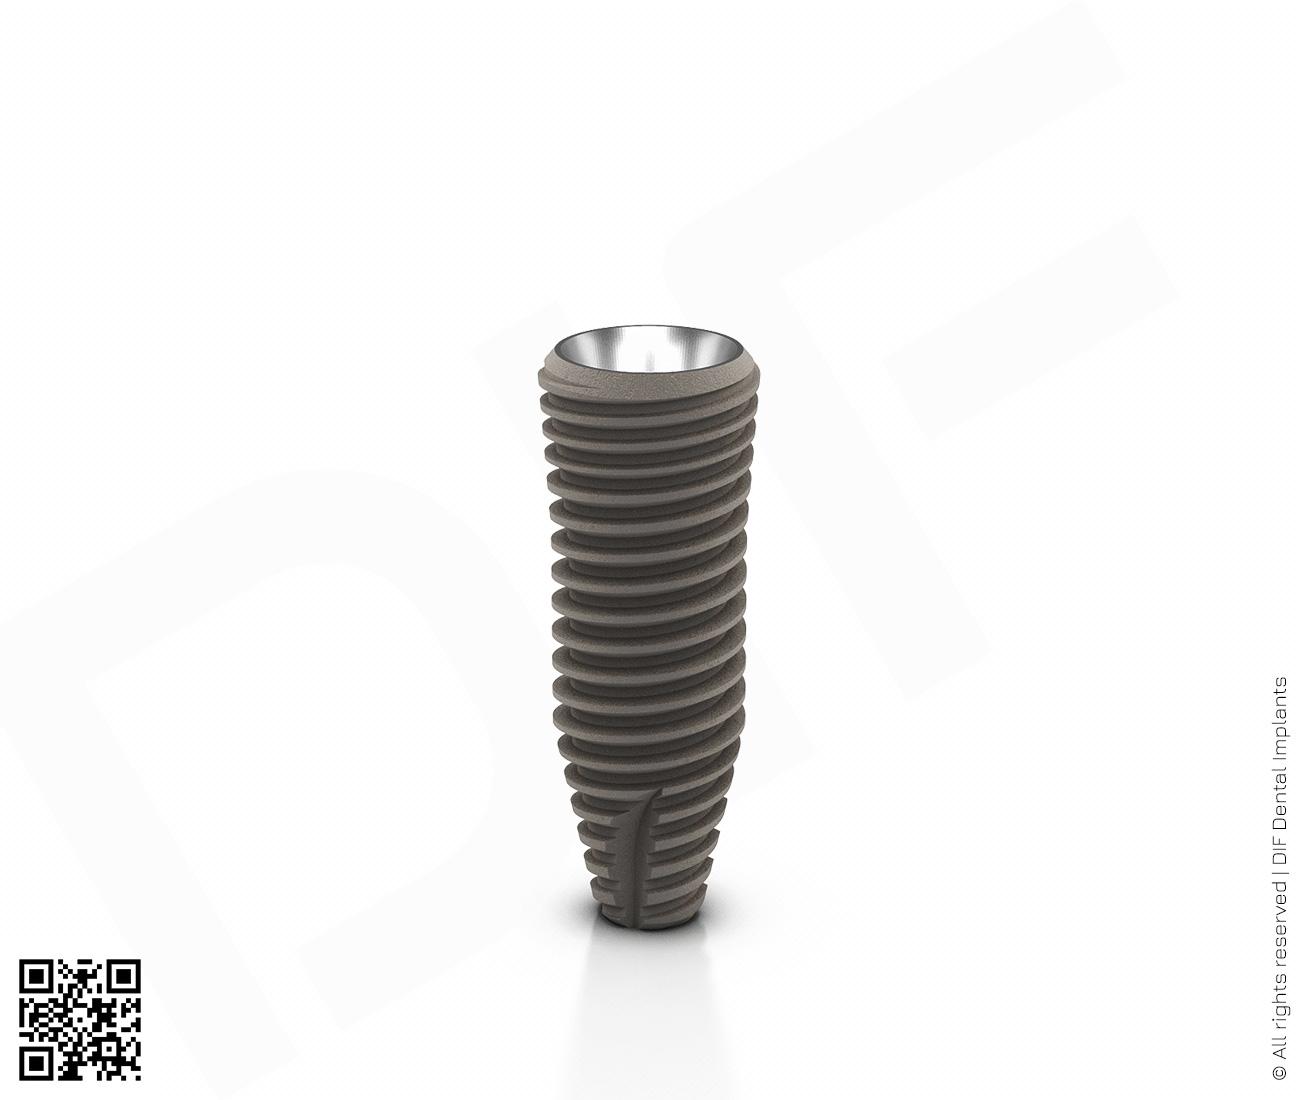 Фото имплантат mainstream fine d4.2 мм – l11.5 мм  производства DIF.